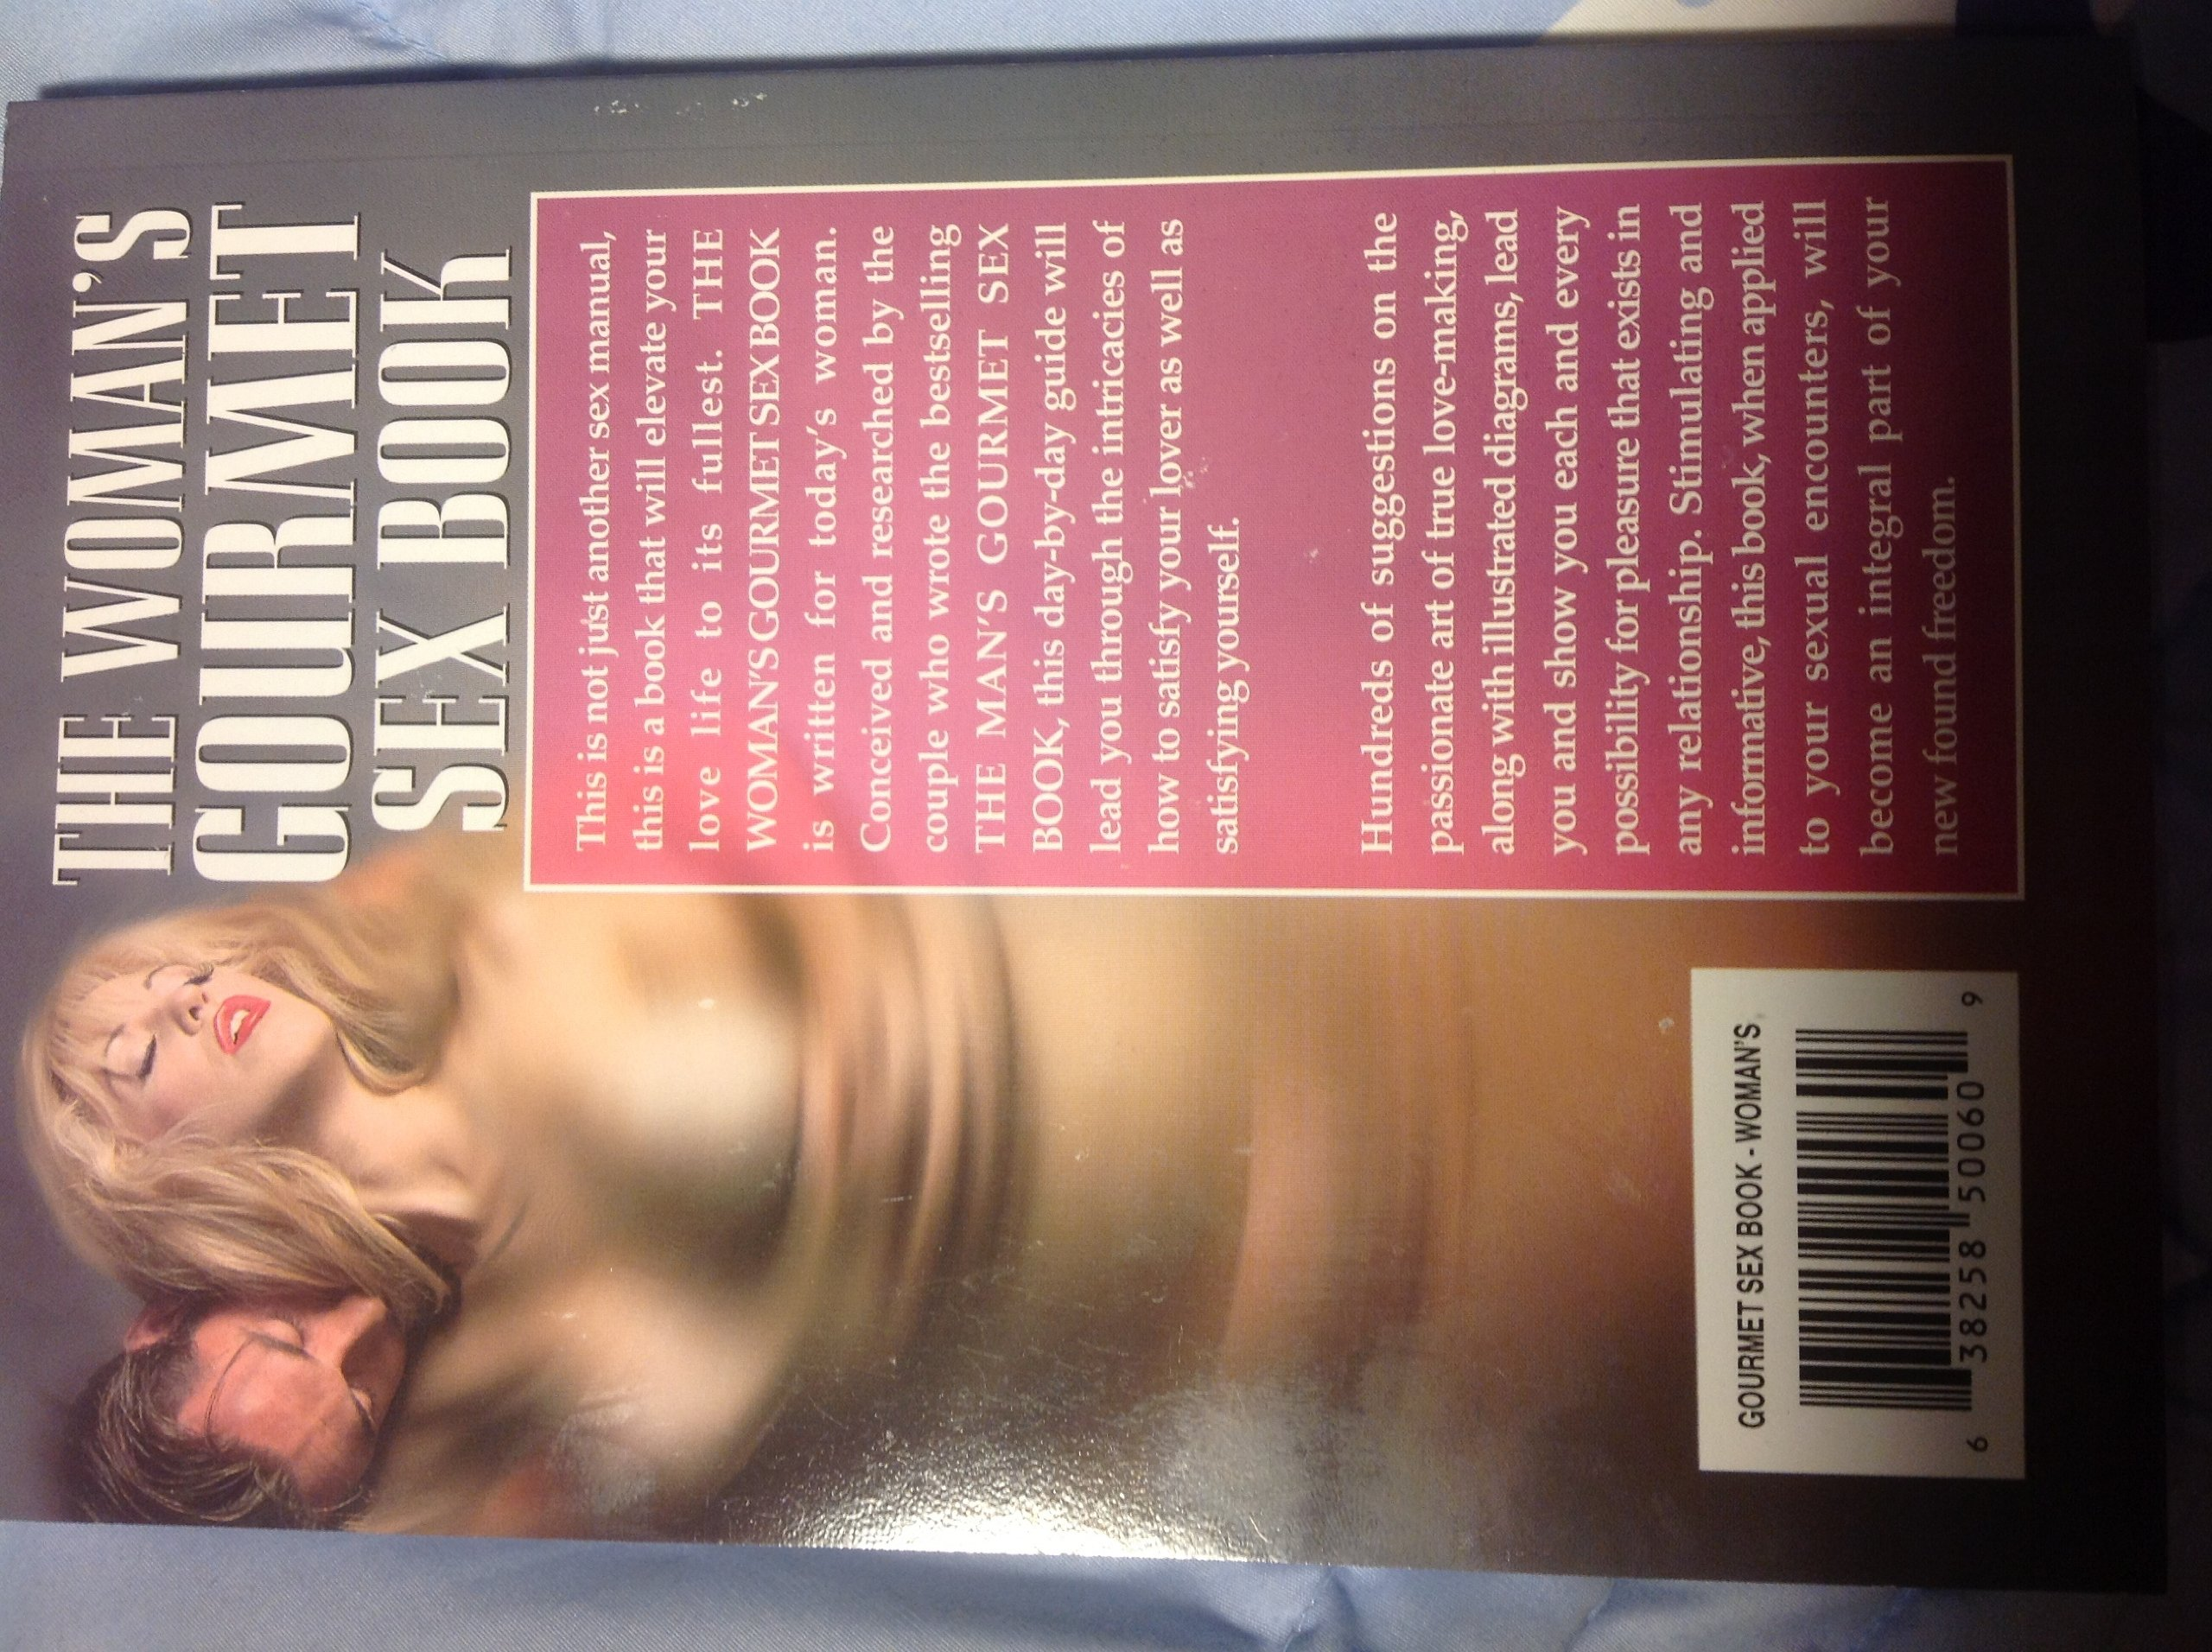 The man gourmet sex book